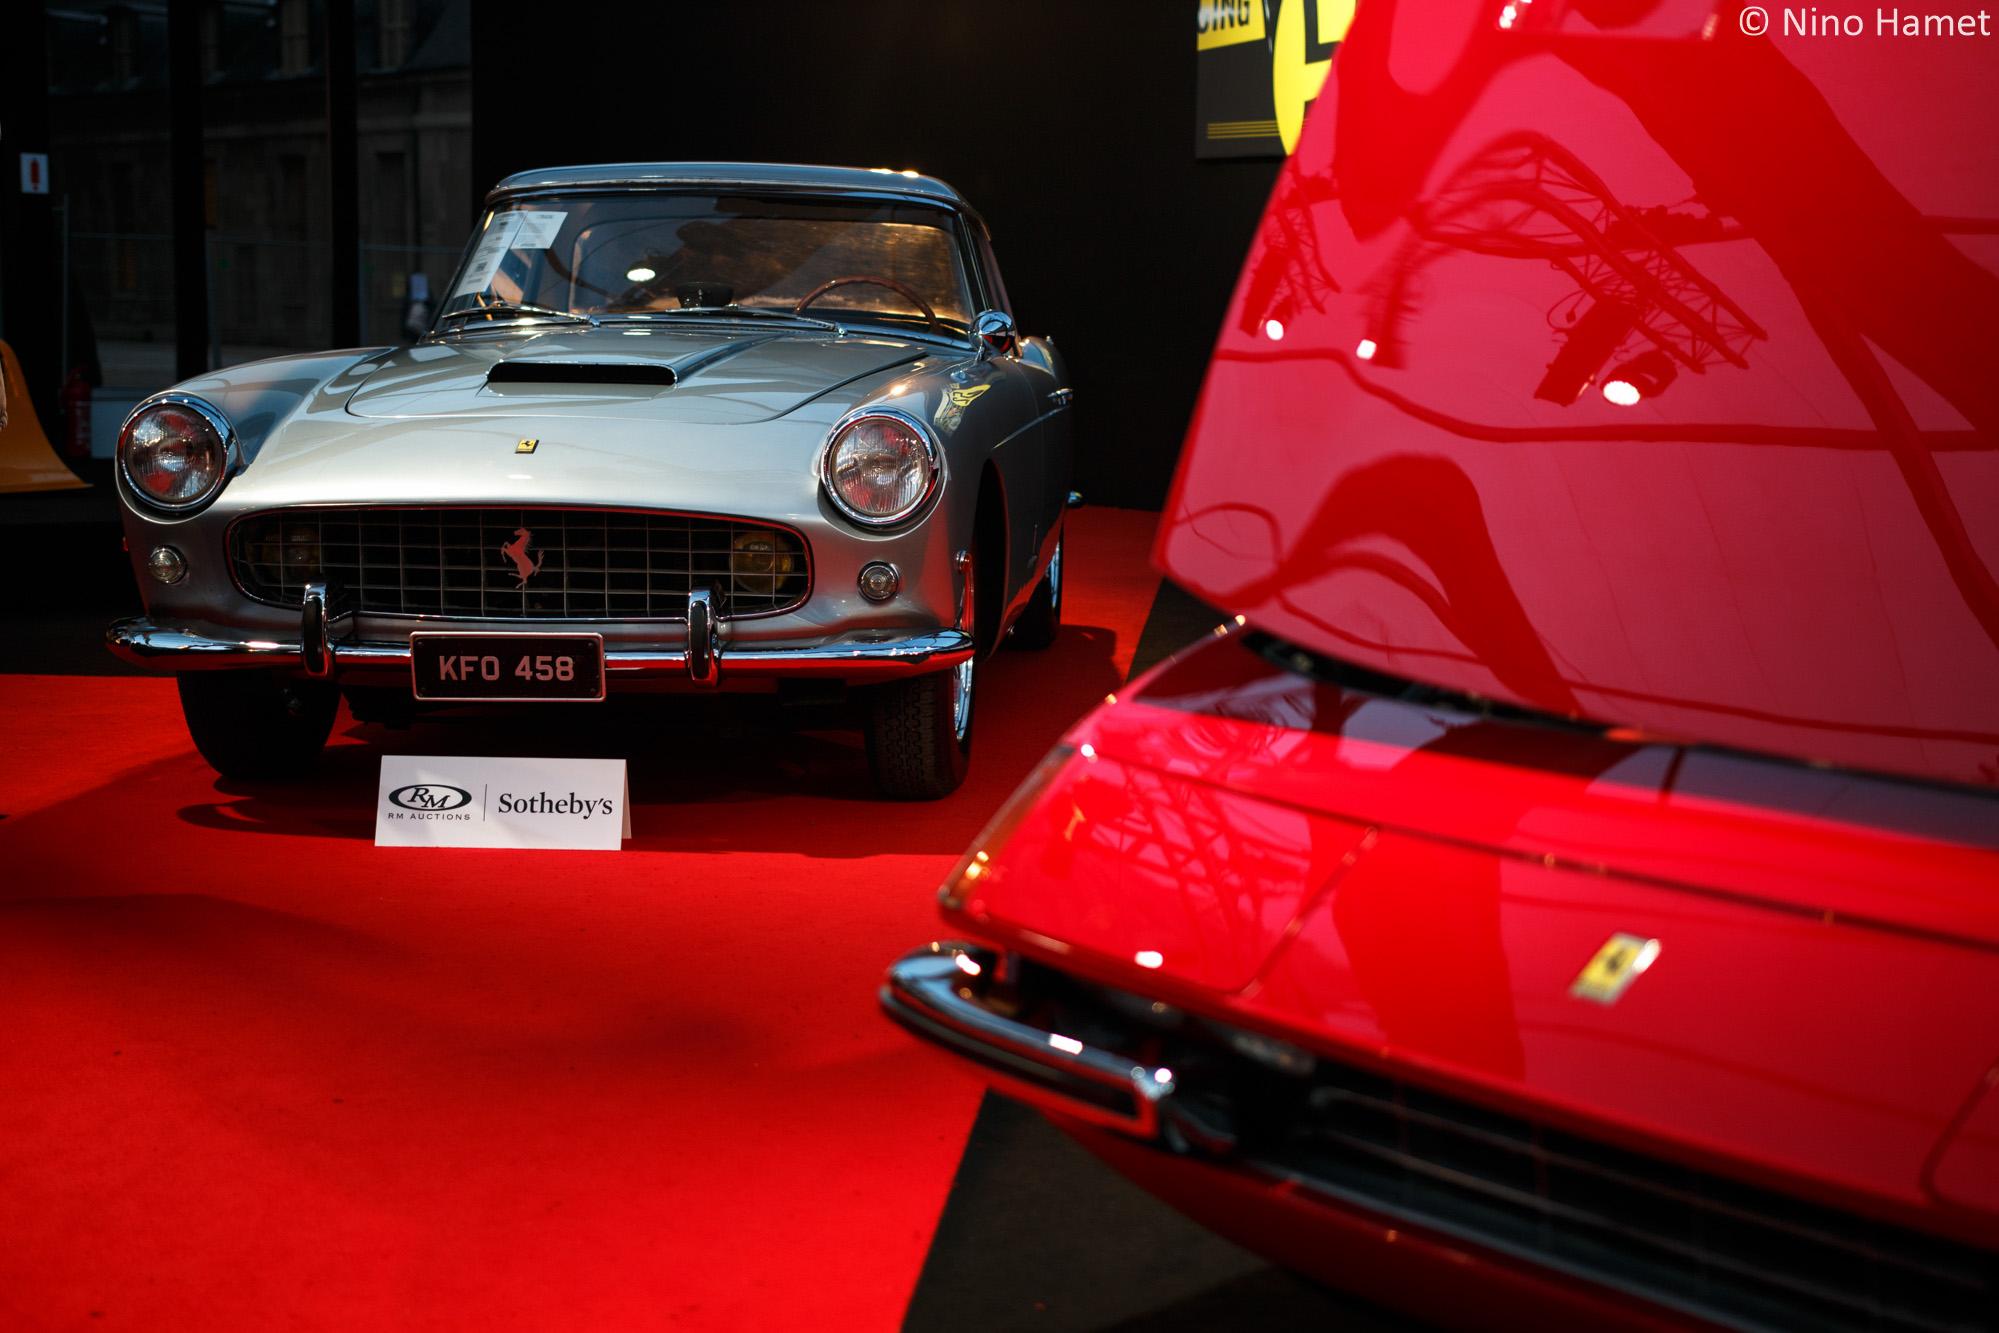 Ferrari 250 GT Cabriolet Pininfarina, cédée 1 100 000 euros. Superbe avec le hard-top.